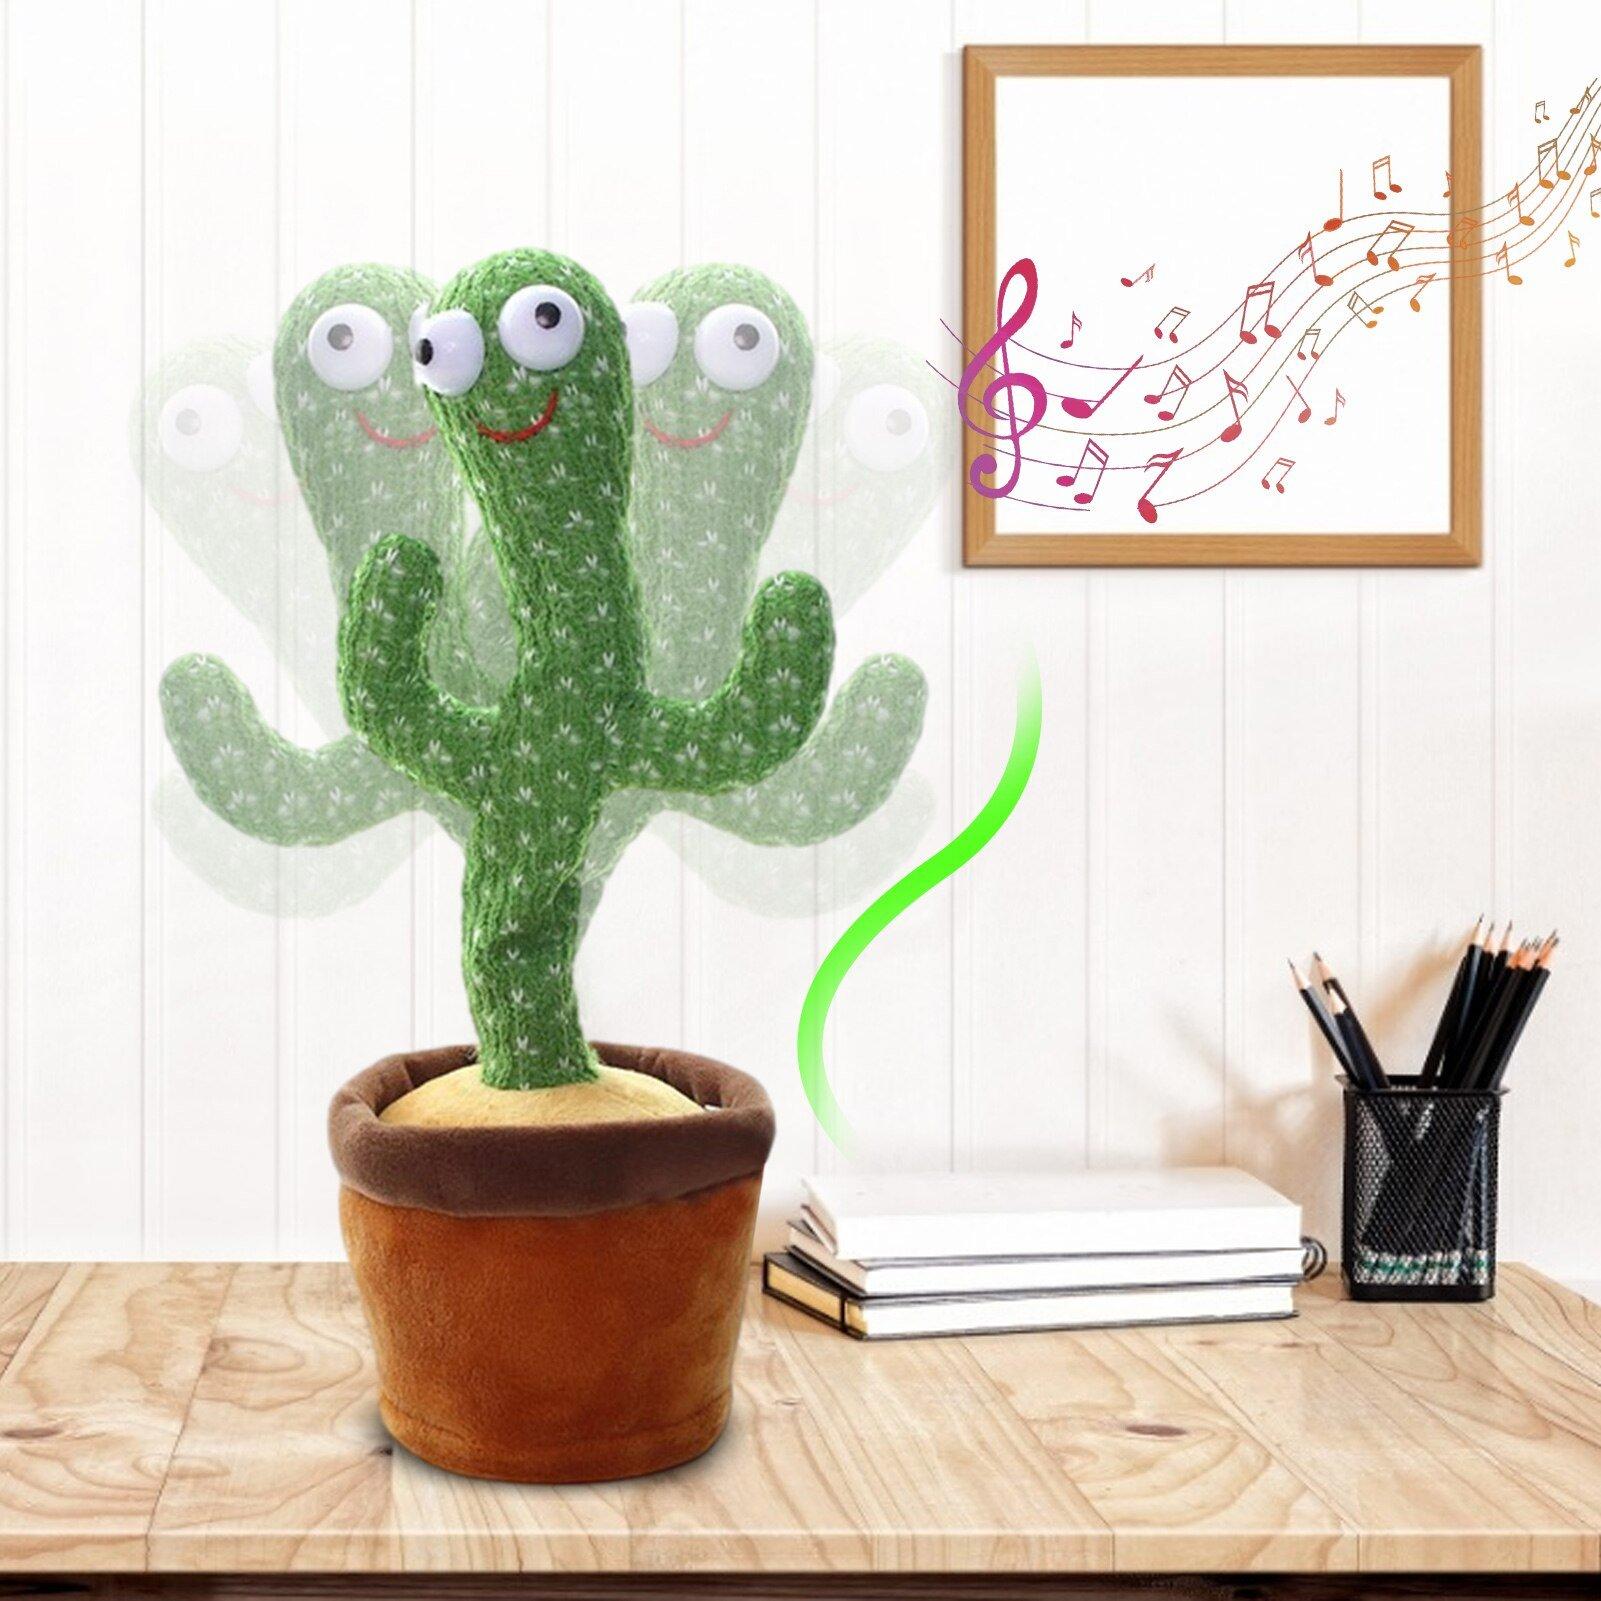 Dancing Cactus Toy 6